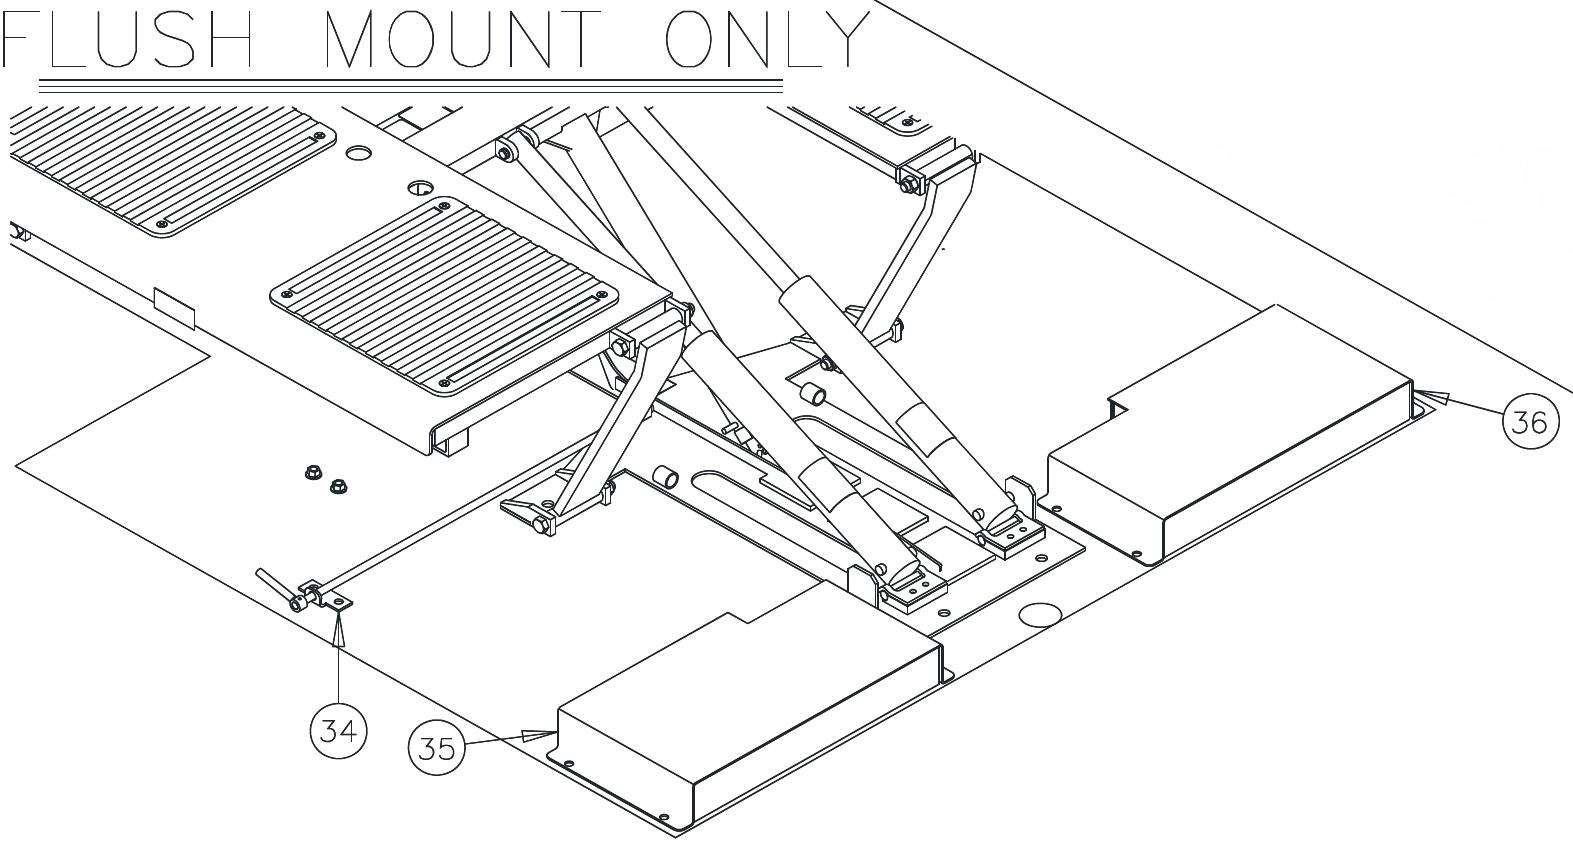 srm10-flush-mount-only-diagram.png